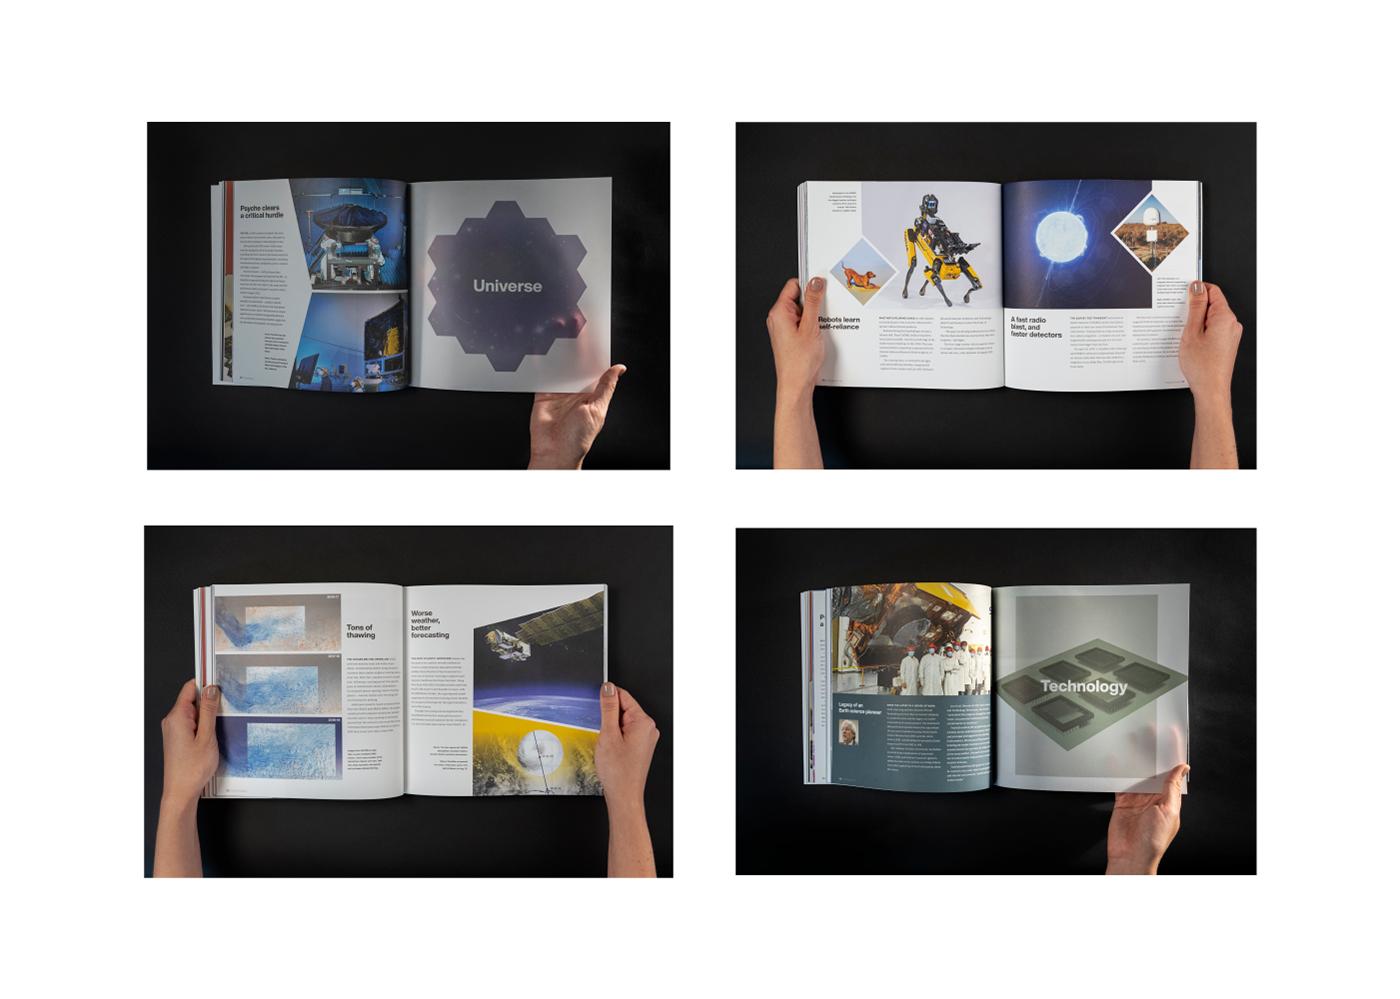 annual report Designlab JPL JPL-Designlab letterpress nasa